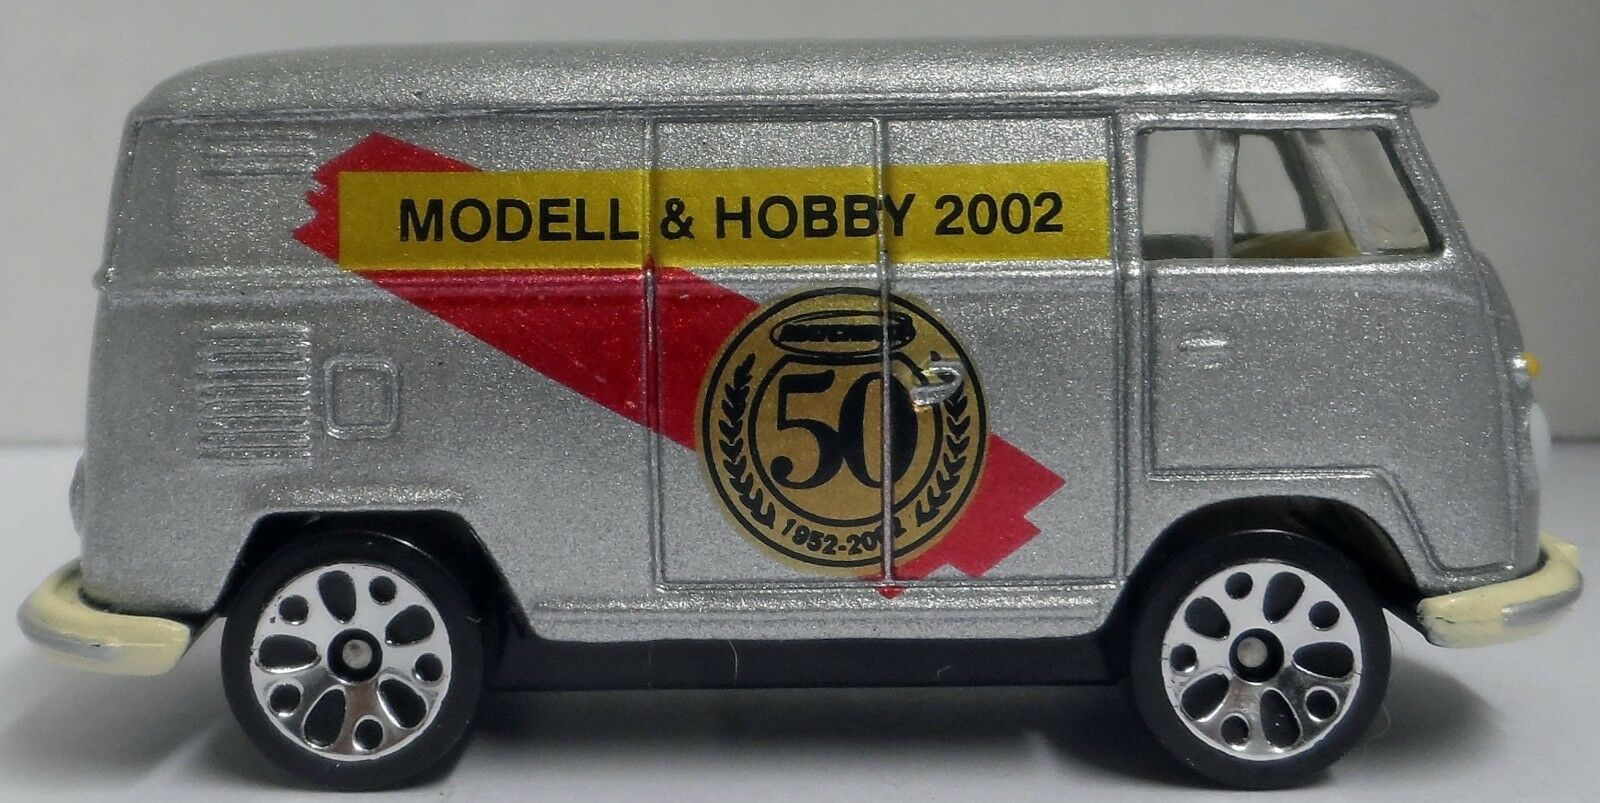 MATCHBOX VW VOLKSWAGEN MATCHBOX Convention  2002 3 Van SET Comme neuf BOXED.  magasin d'offre